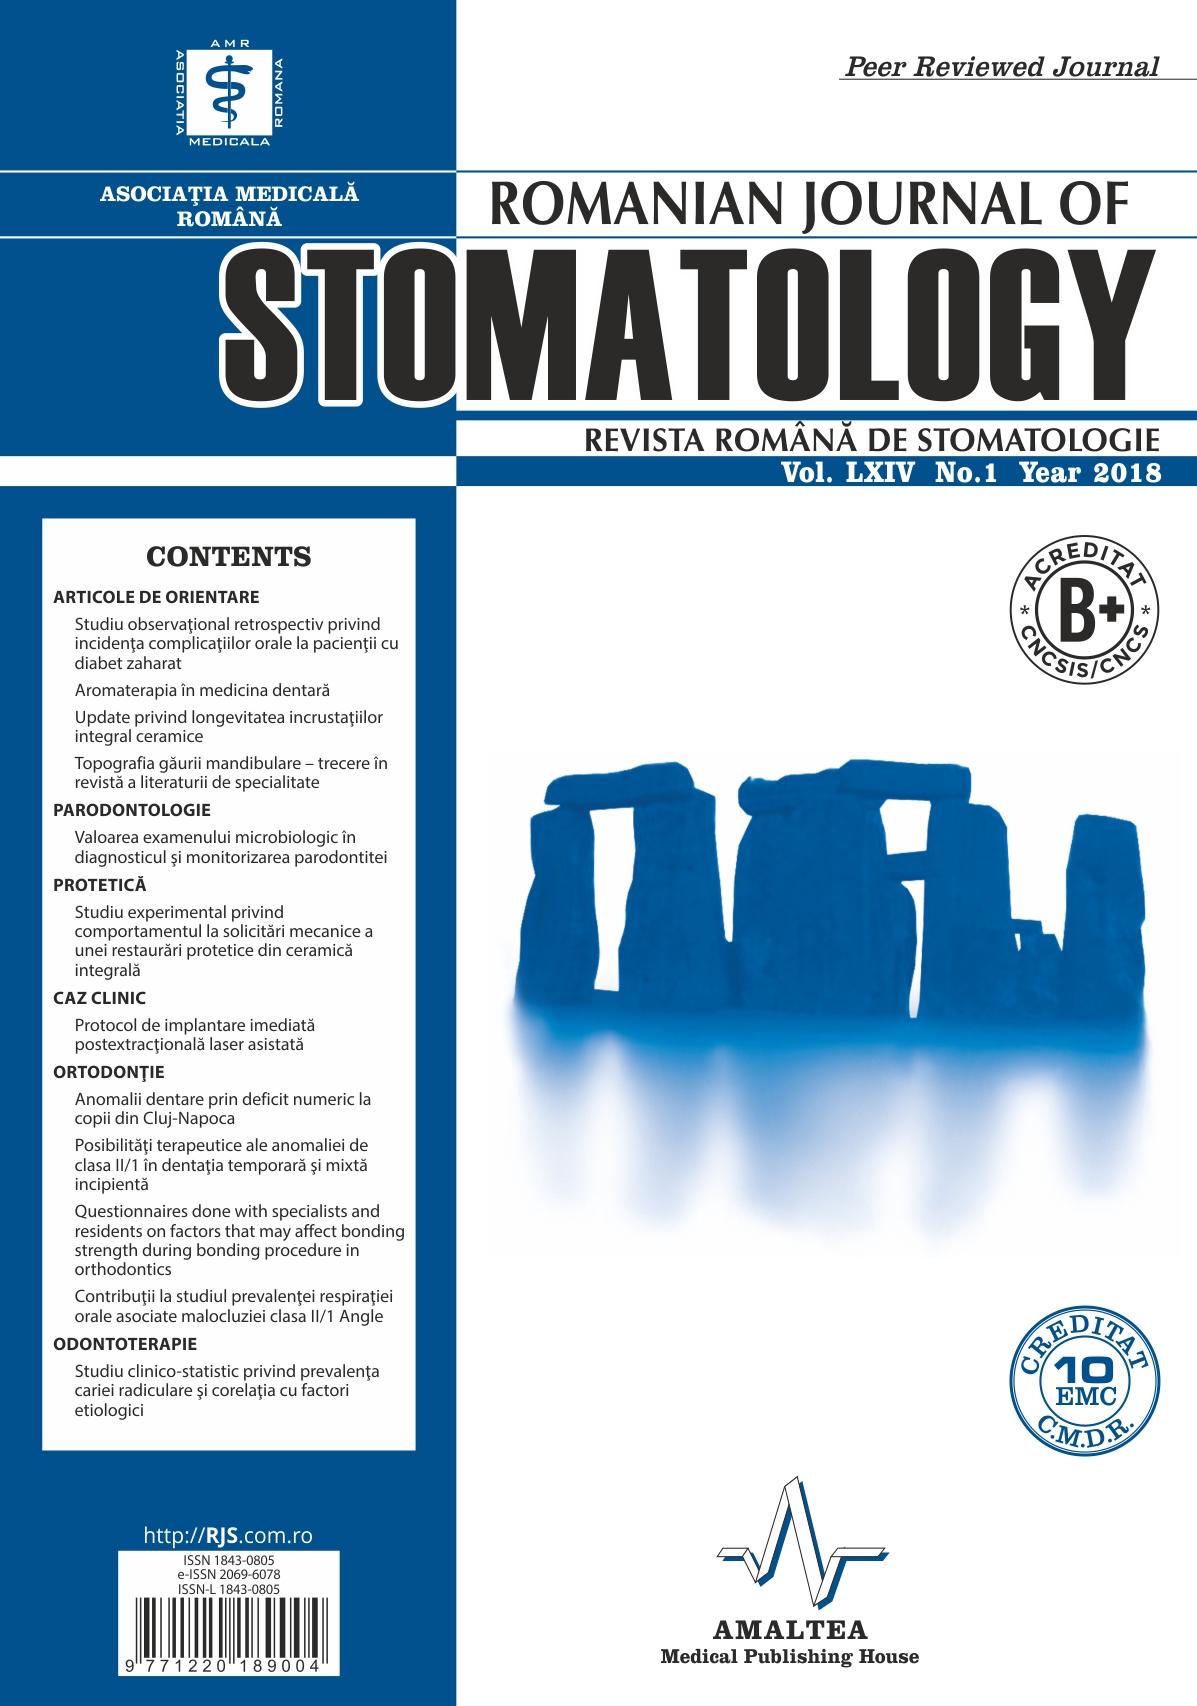 Revista Romana de STOMATOLOGIE - Romanian Journal of Stomatology, Vol. LXIV, Nr. 1, An 2018